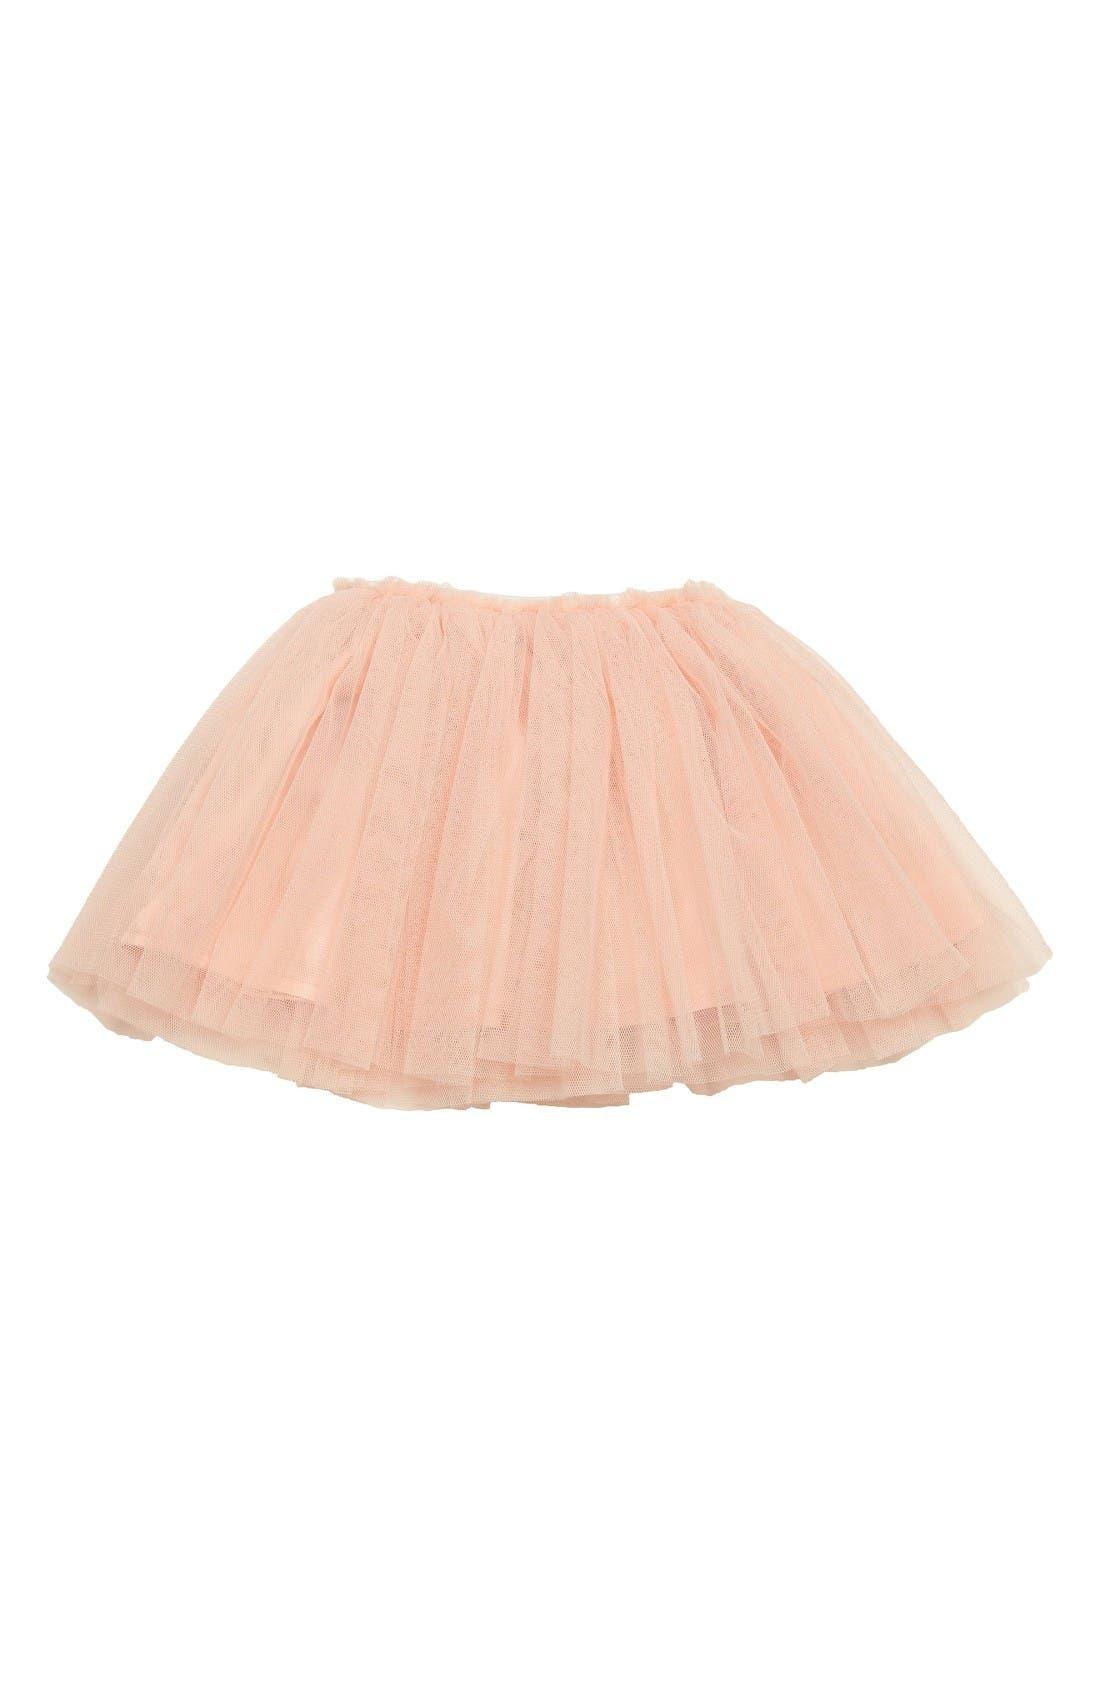 Tutu Skirt,                             Alternate thumbnail 2, color,                             Rose